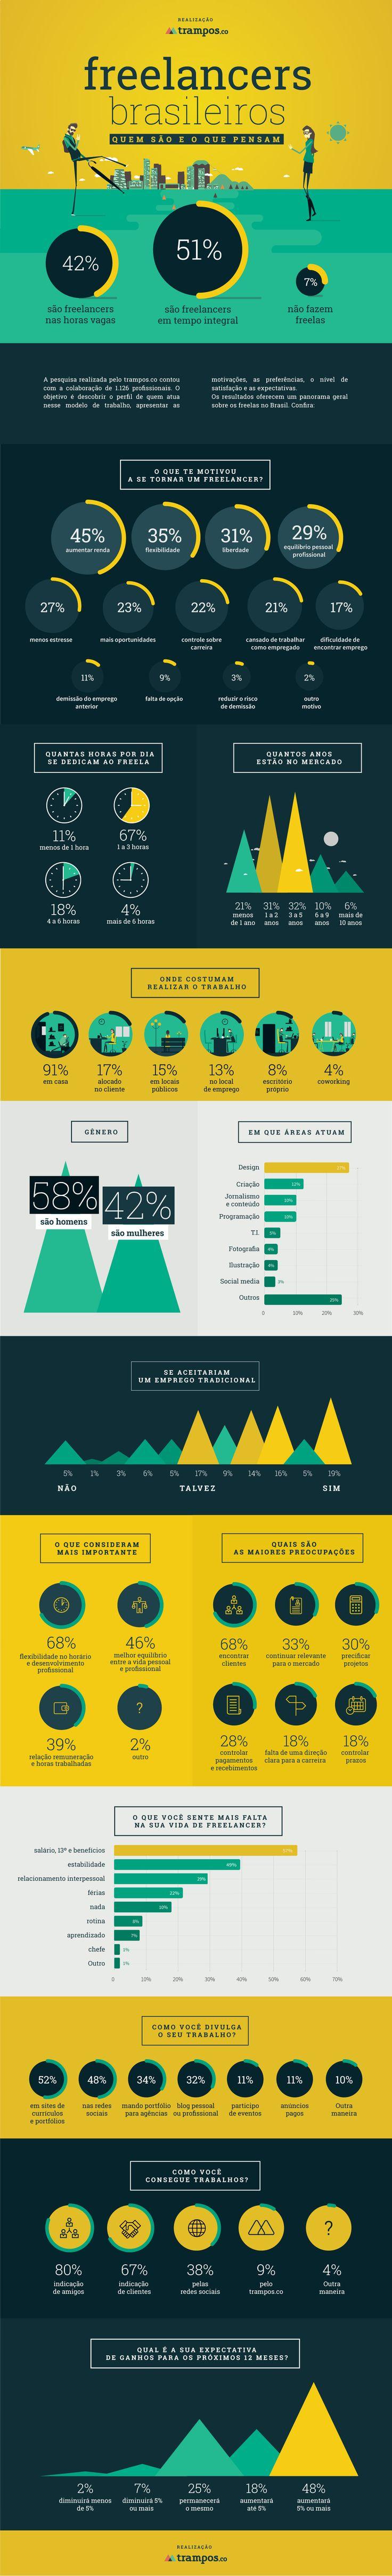 Infográfico: Freelancer Brasileiro